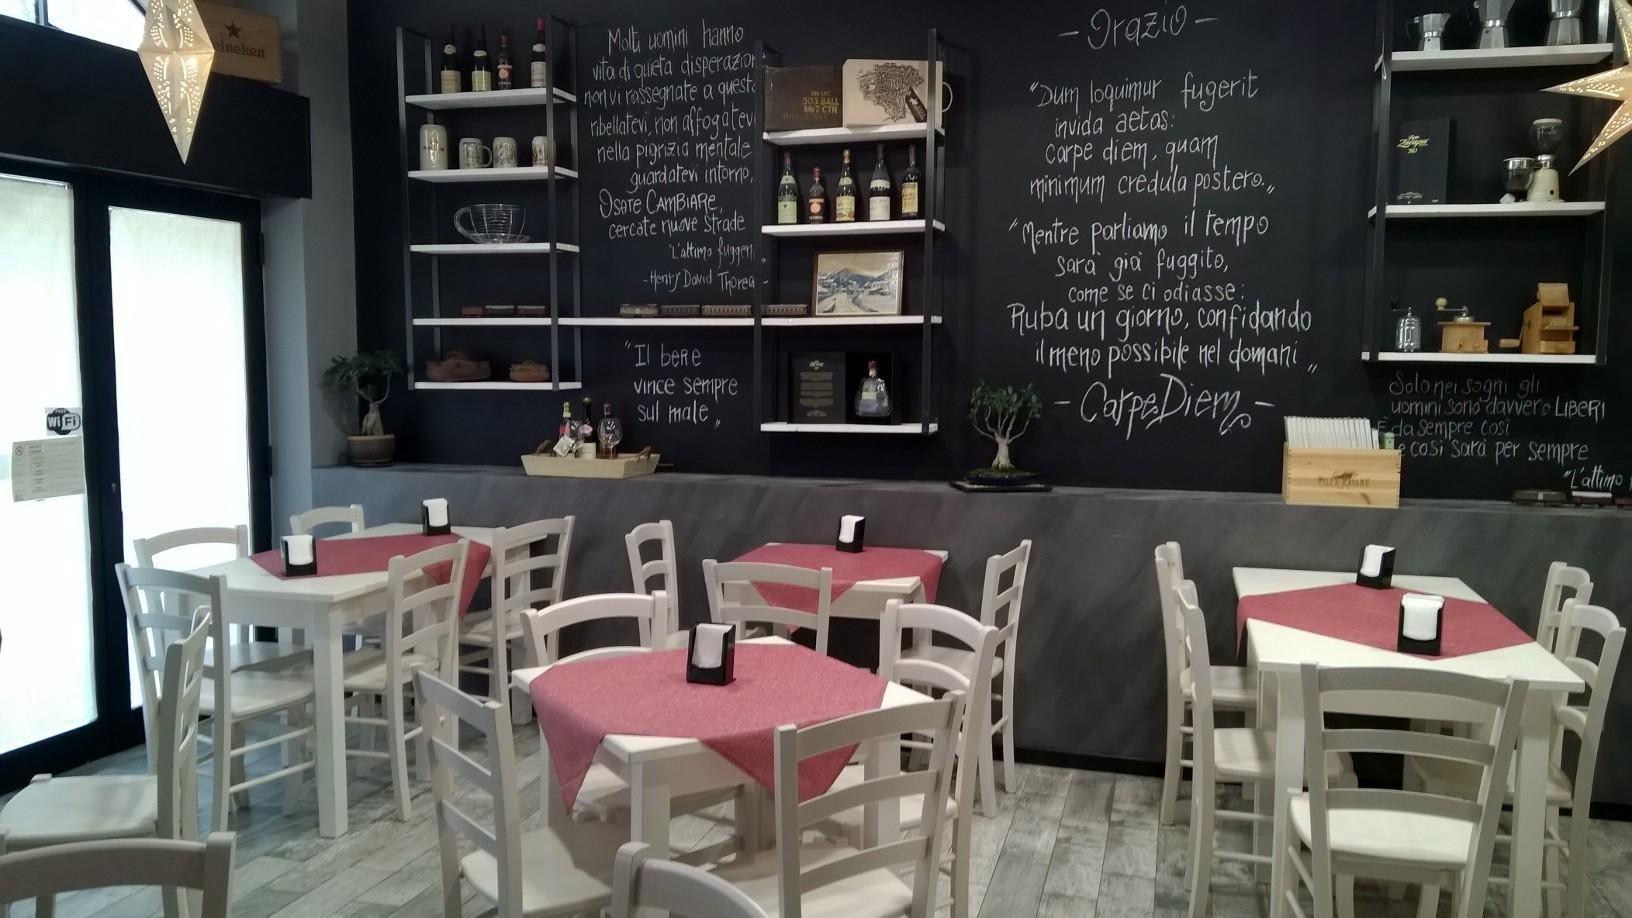 Tavolo taverna ~ Sedie taverna mobilificiomaieron soggiorno o taverna in